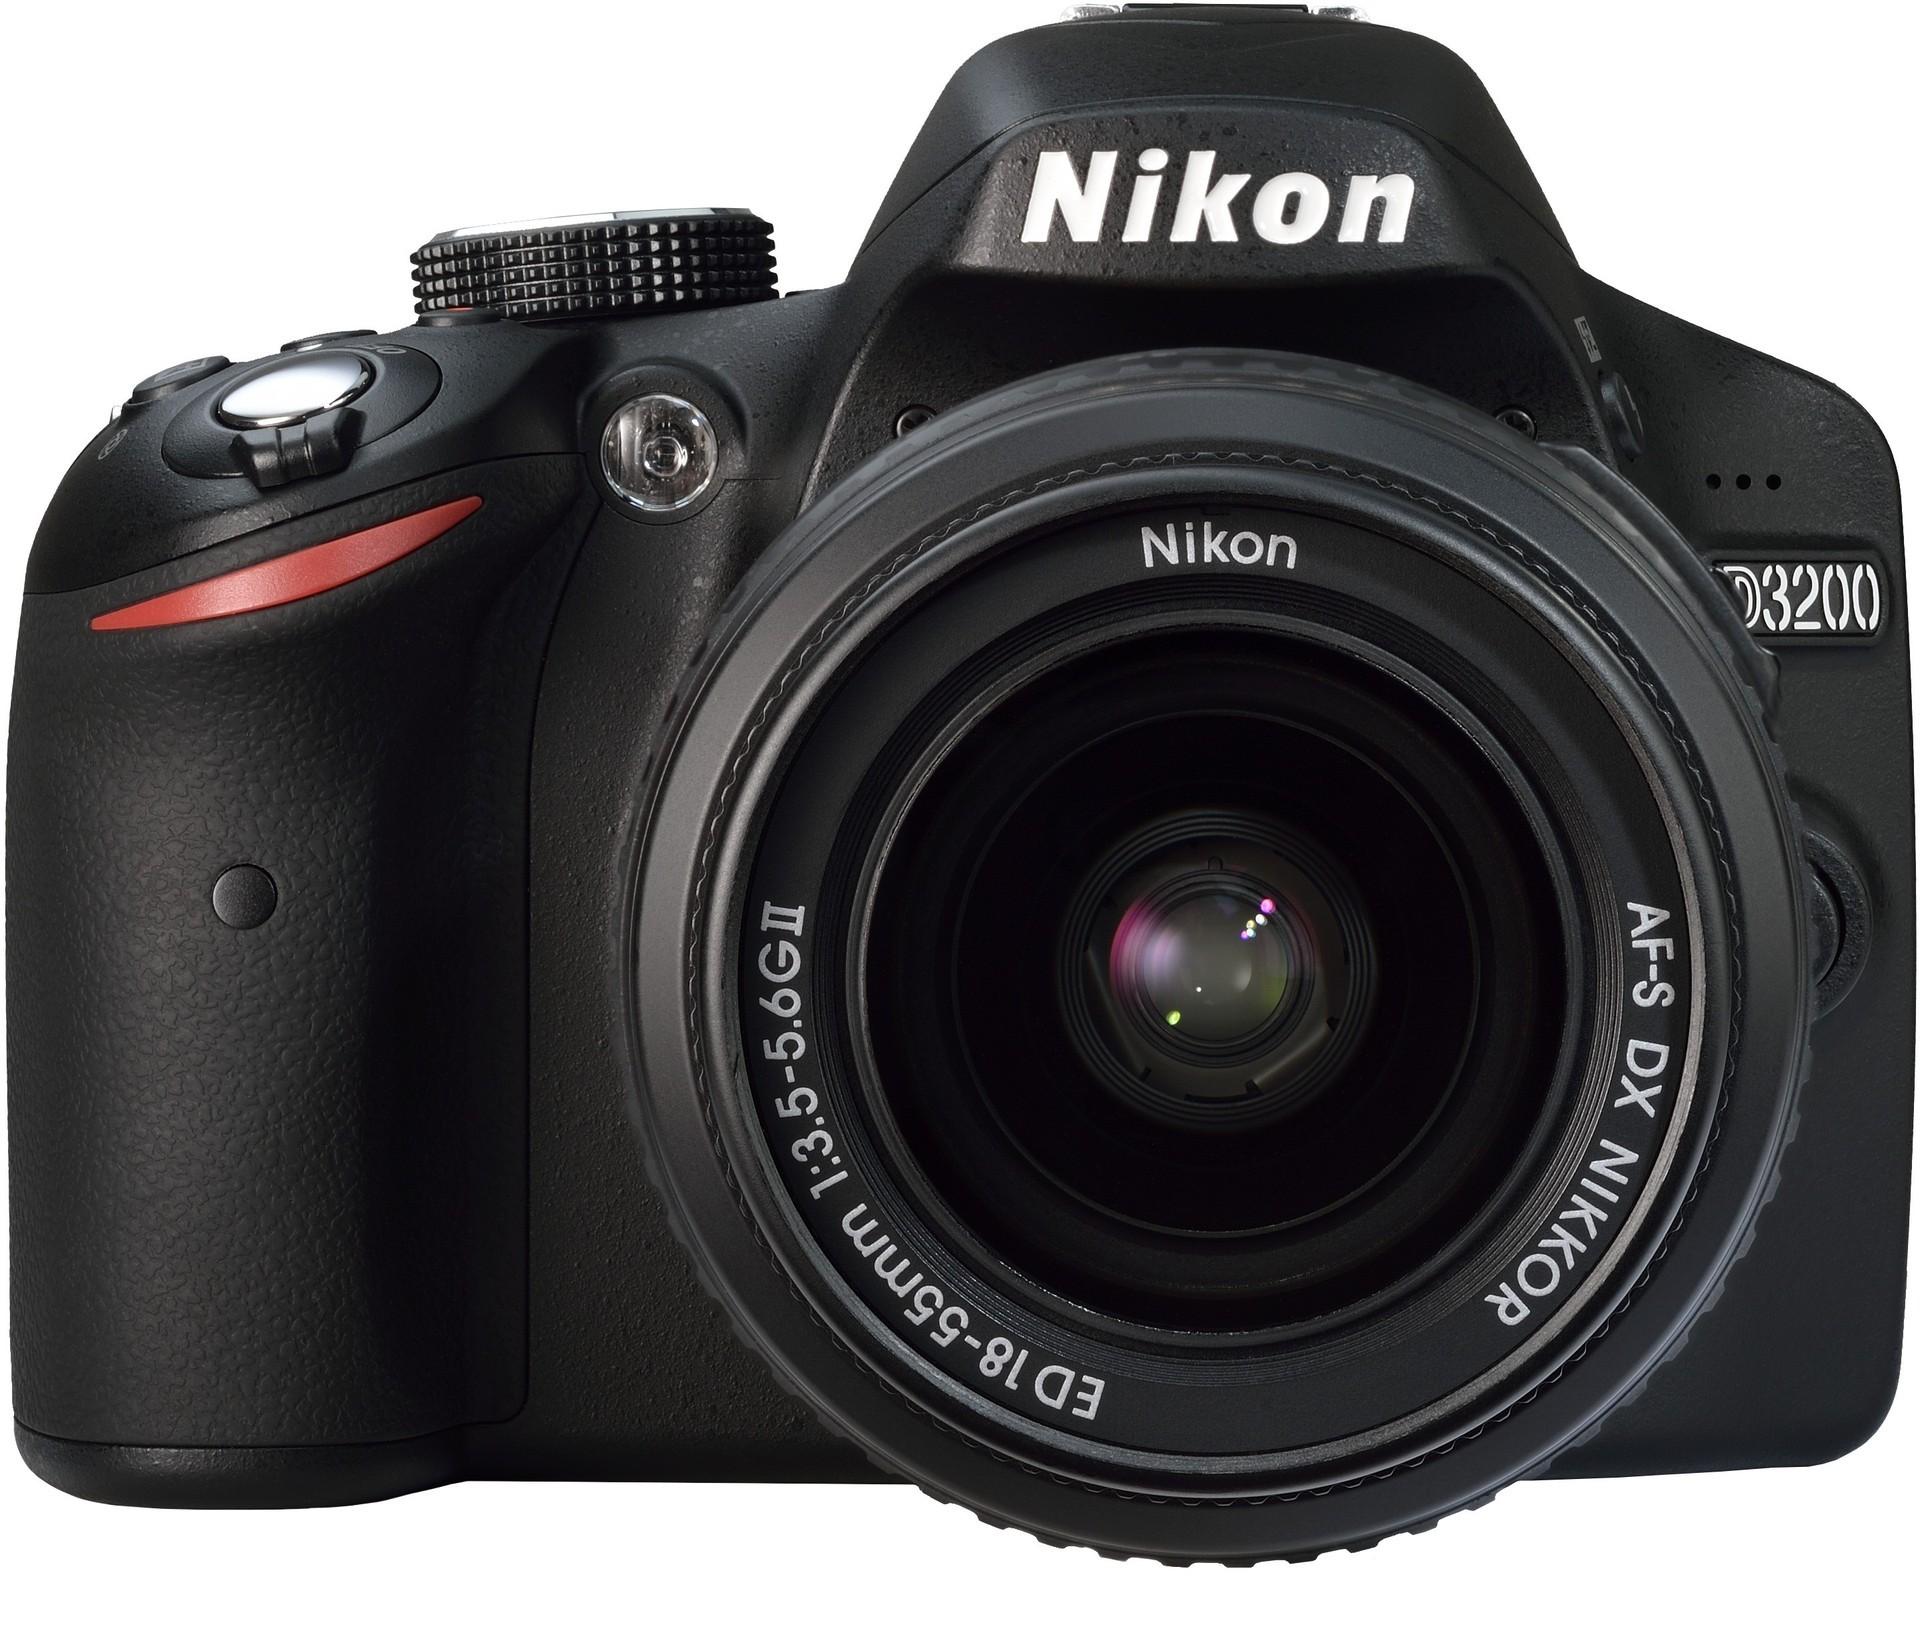 Camera Nikon Dslr Camera Models With Price dslr camera price in pakistan hashmi photos shop